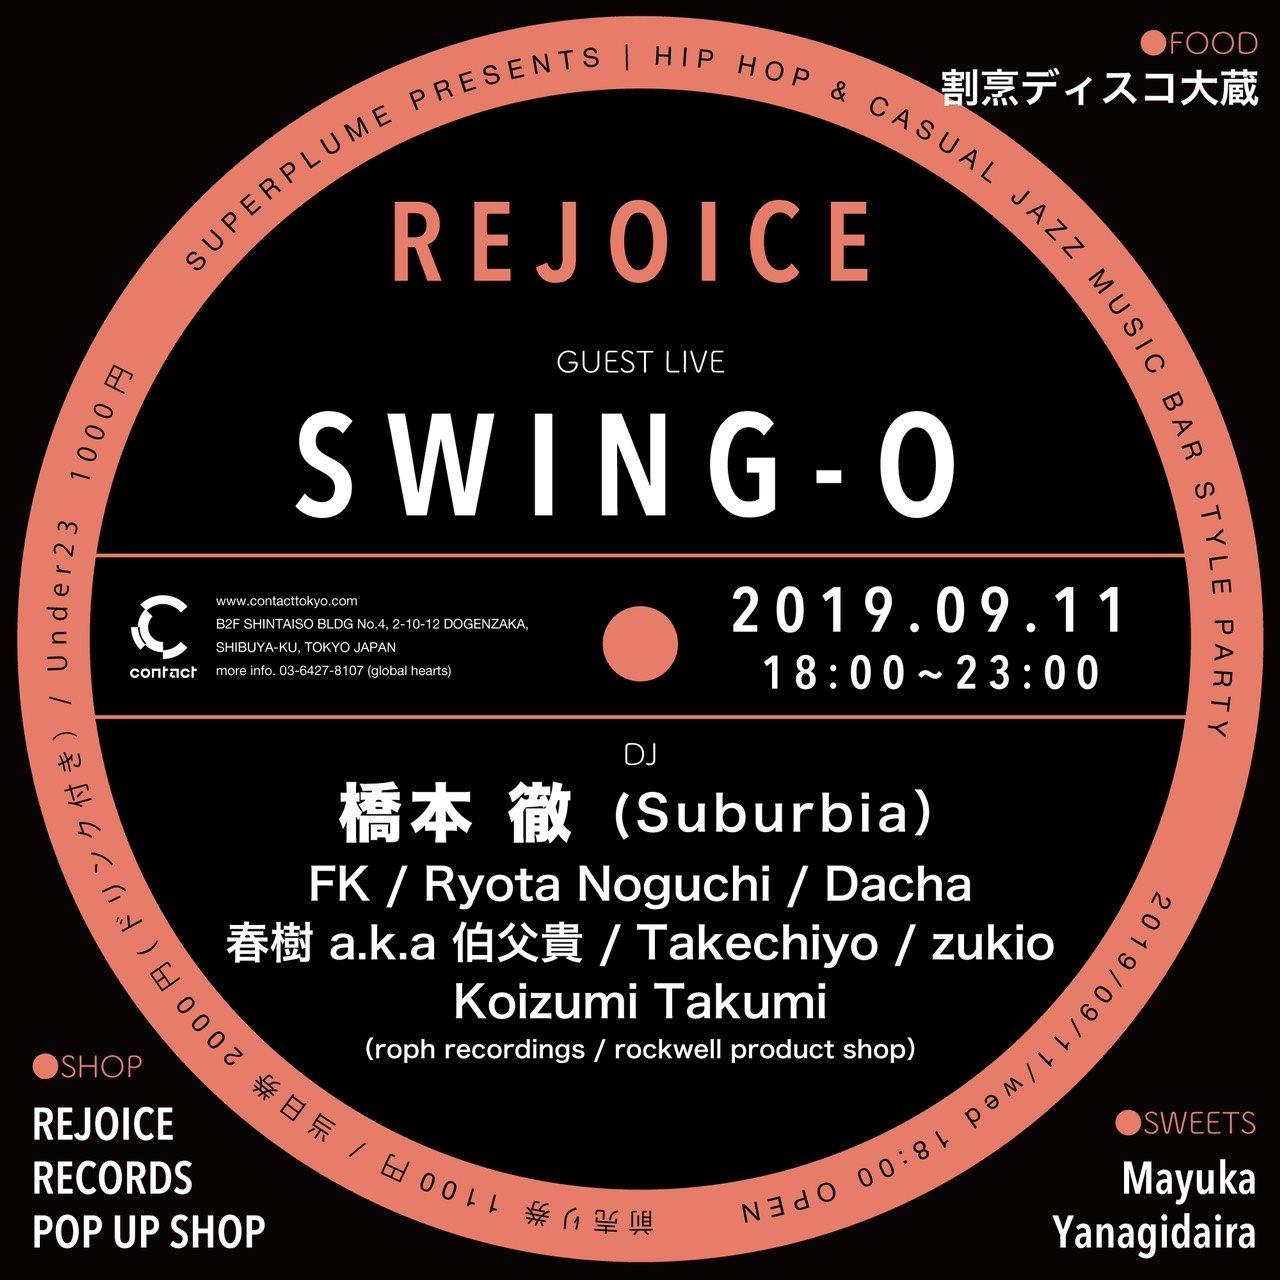 Super Plume presents Rejoice - Flyer front